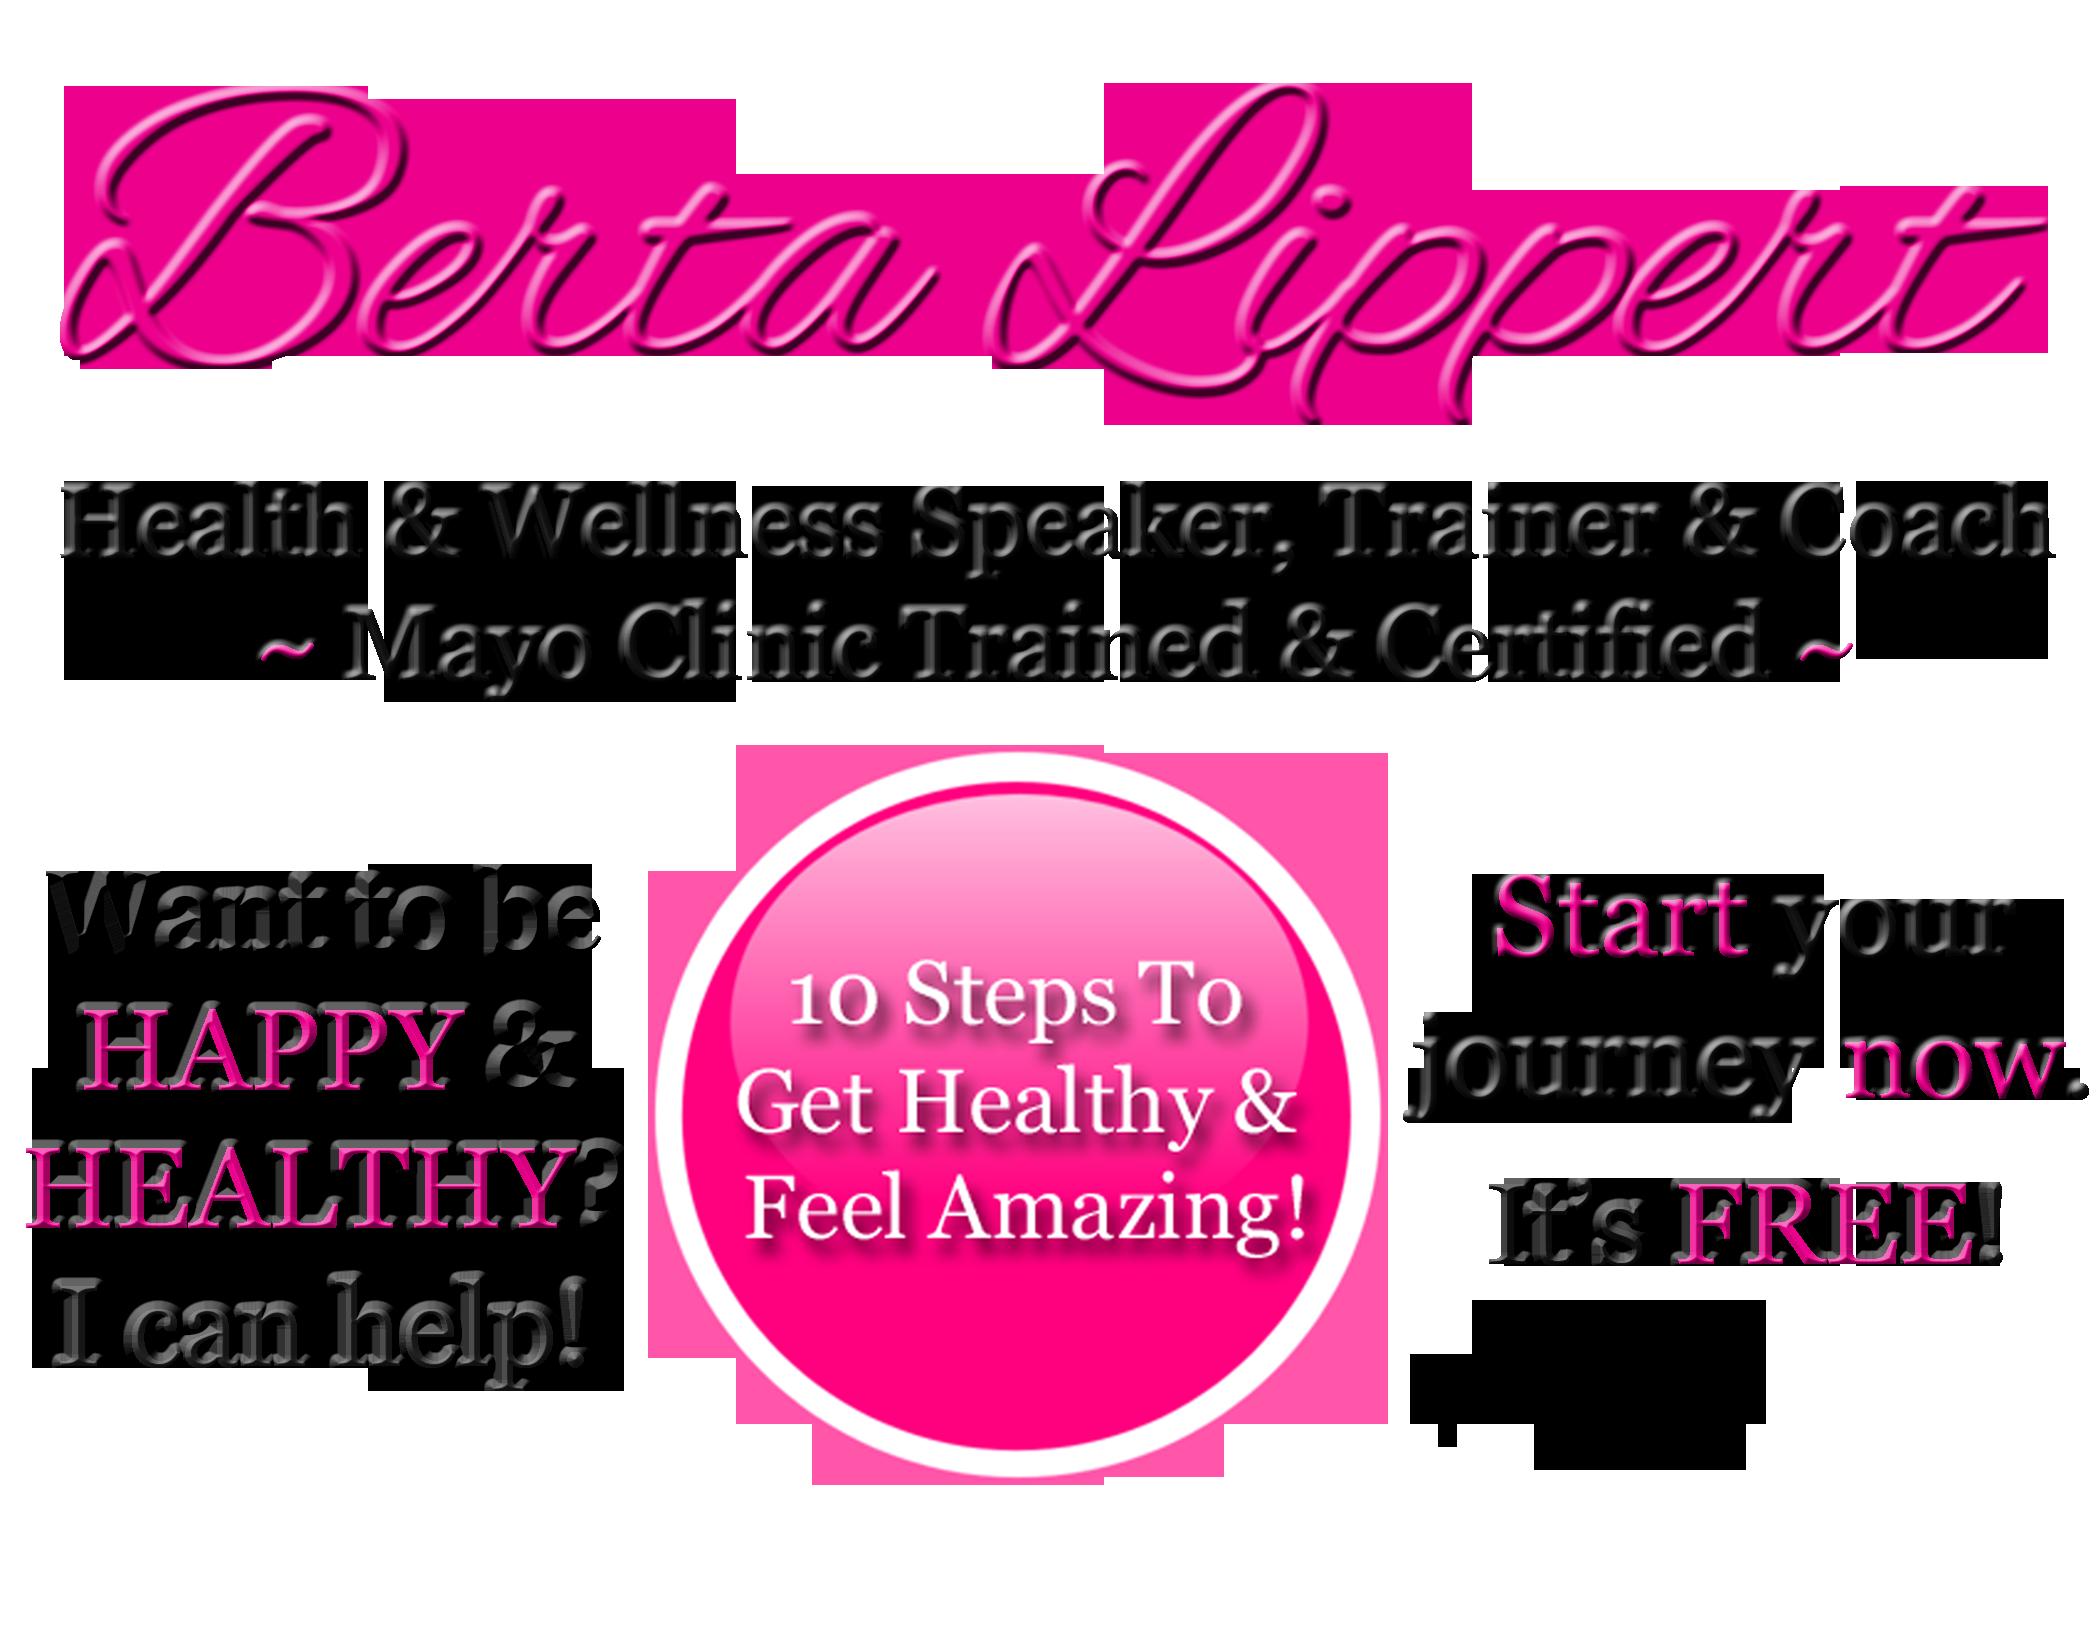 Berta Lippert Mayo Clinic Certified Wellness Coach